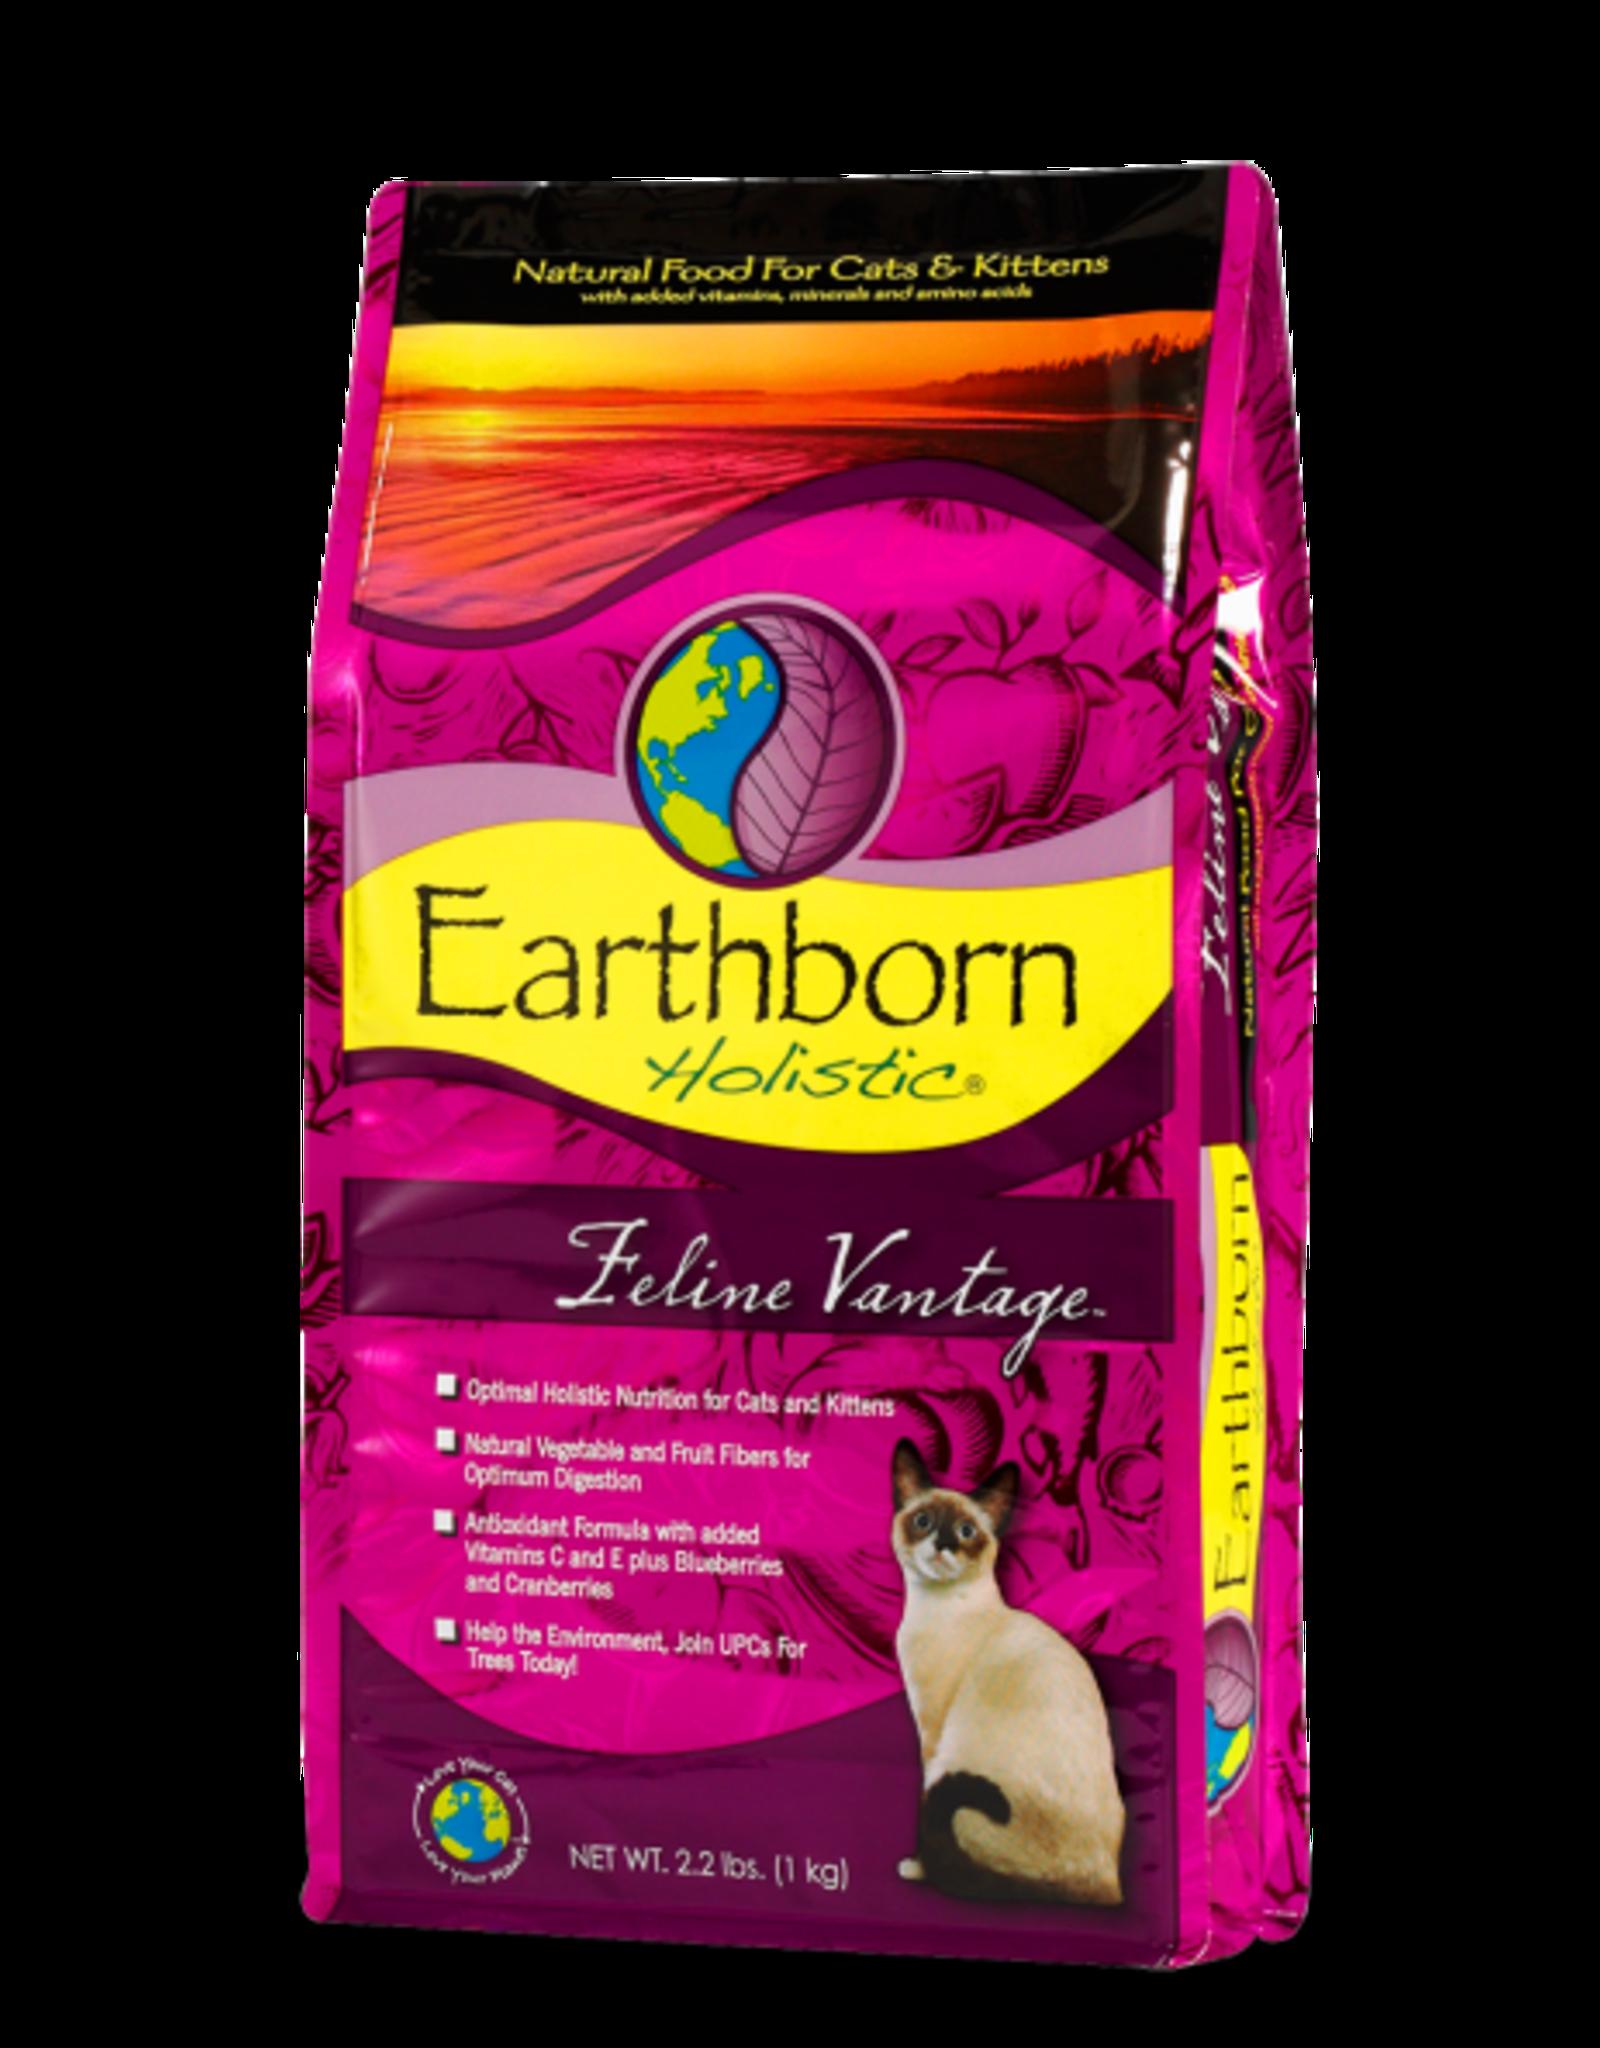 EARTHBORN EARTHBORN HOLISTIC CAT FELINE VANTAGE 5#